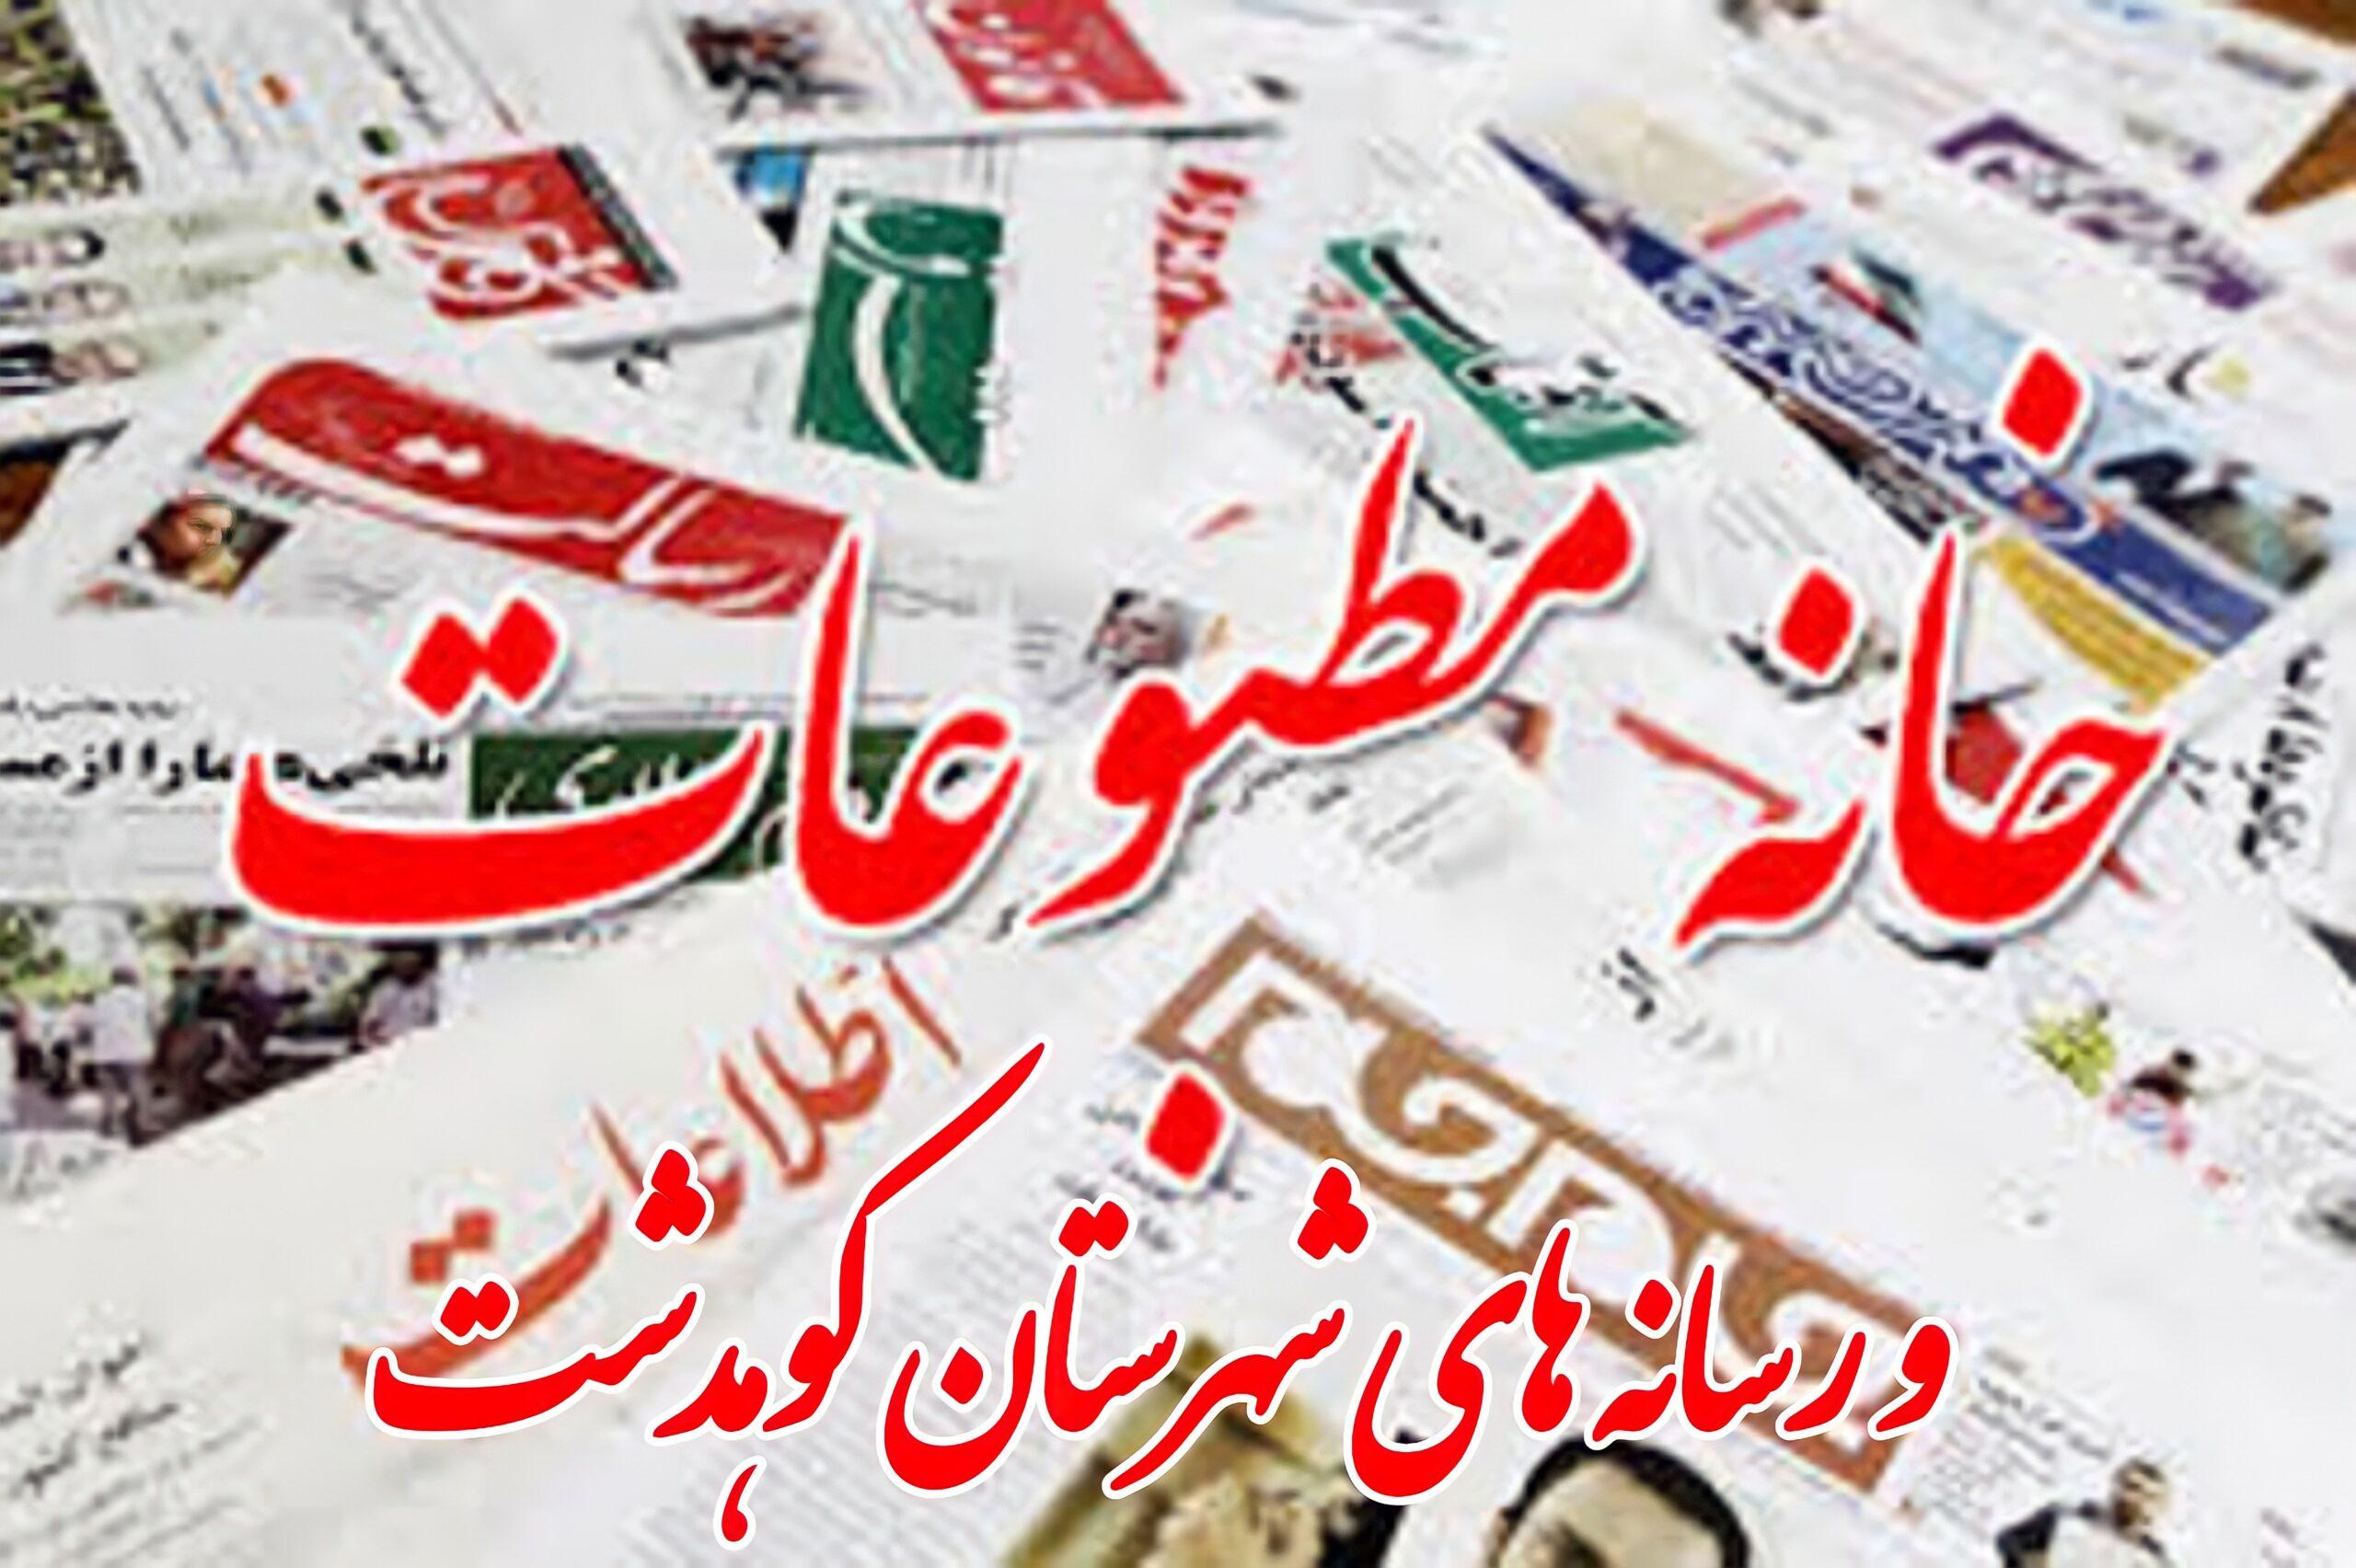 پیام تبریک خانه مطبوعات ورسانه های شهرستان کوهدشت بمناسبت هفته معلم: